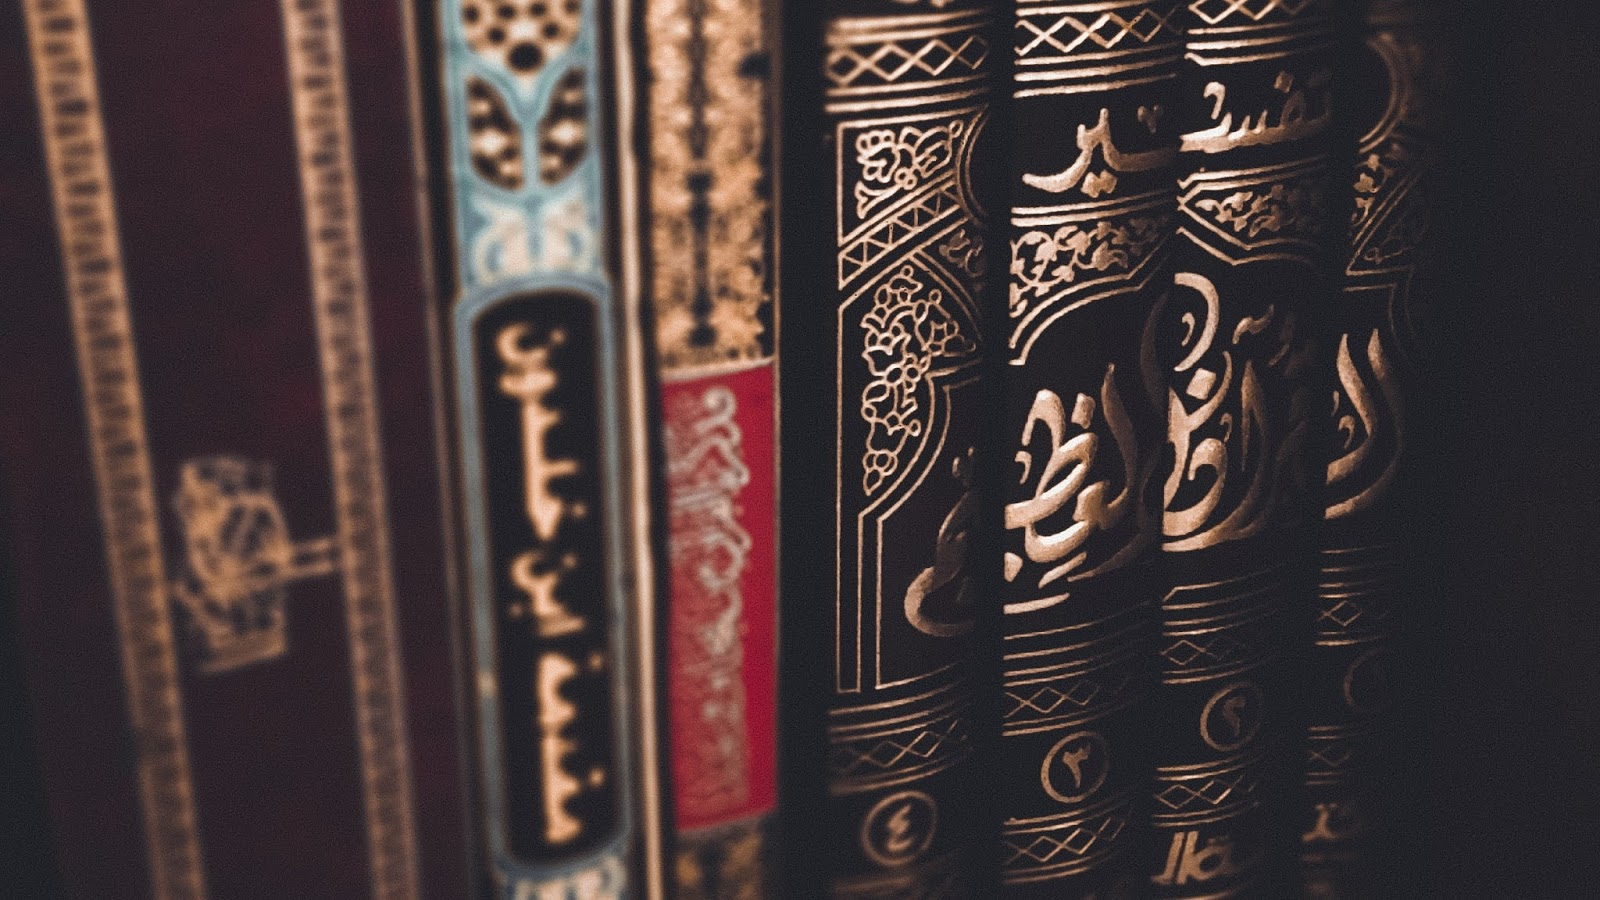 Bantahan Julukan Wahhabi Untuk Syaikh Muhammad bin Abdil Wahhab